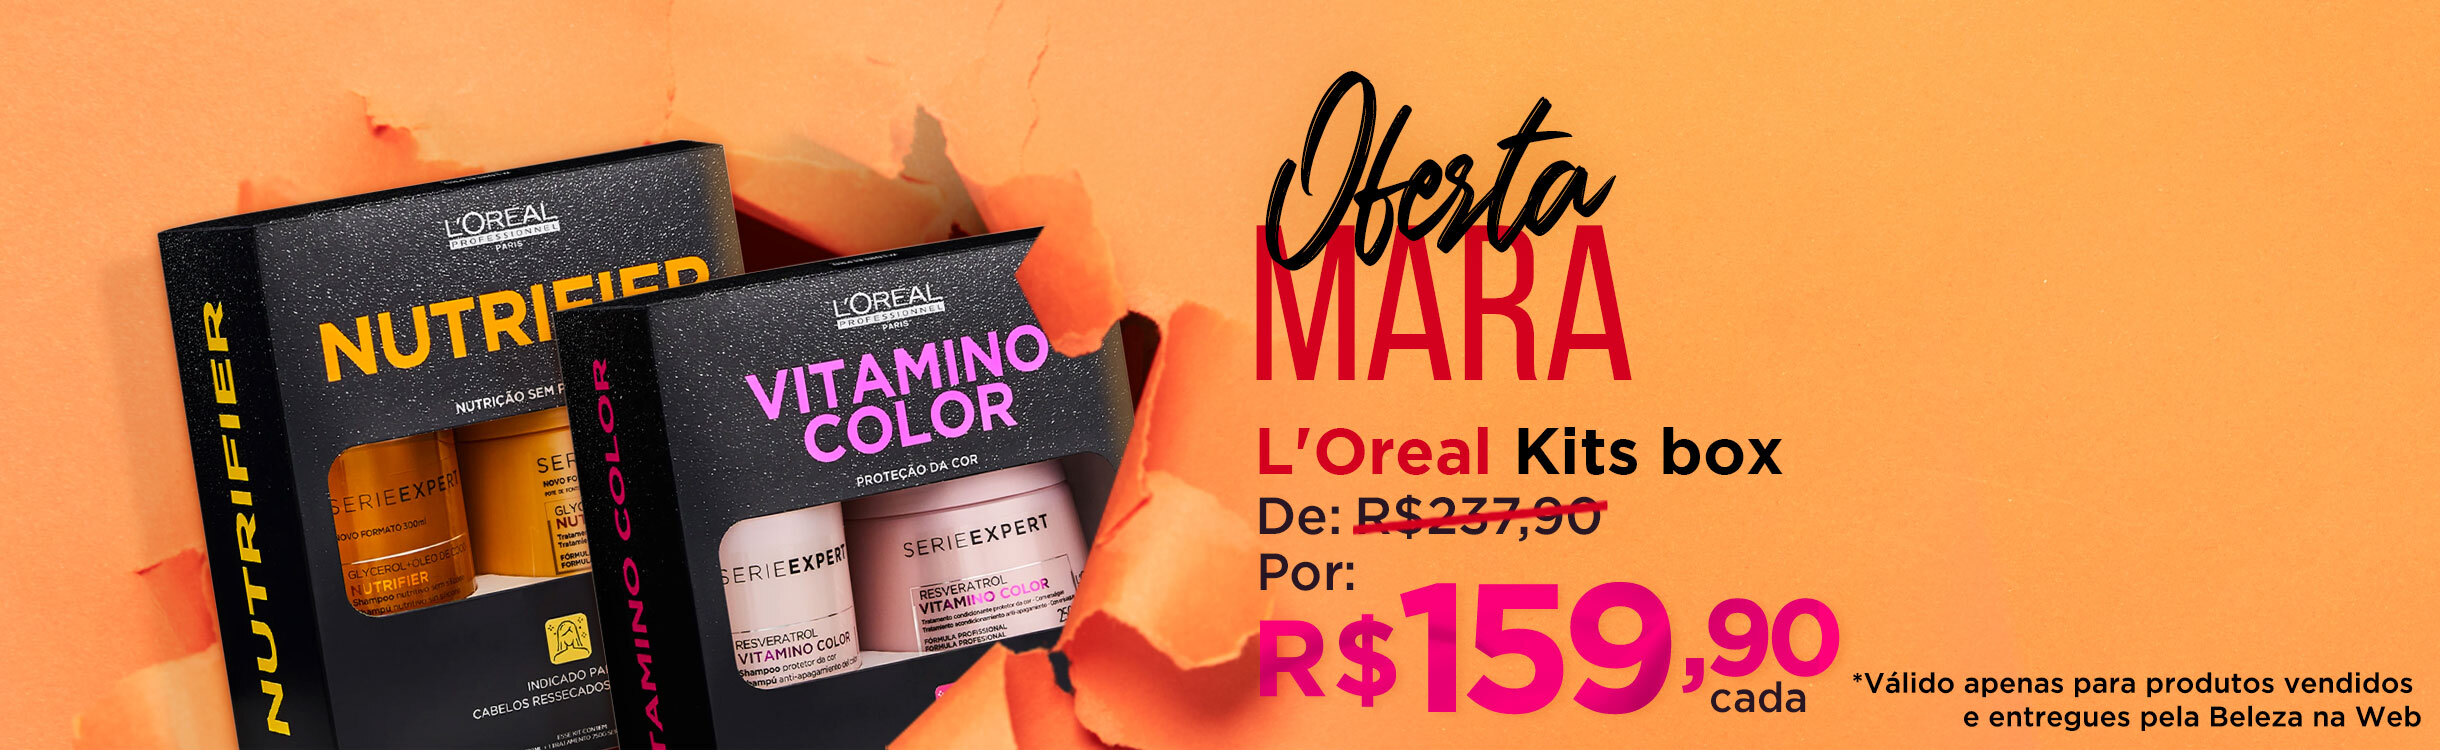 Oferta Mara | Loreal Kits Box Por R$159,90